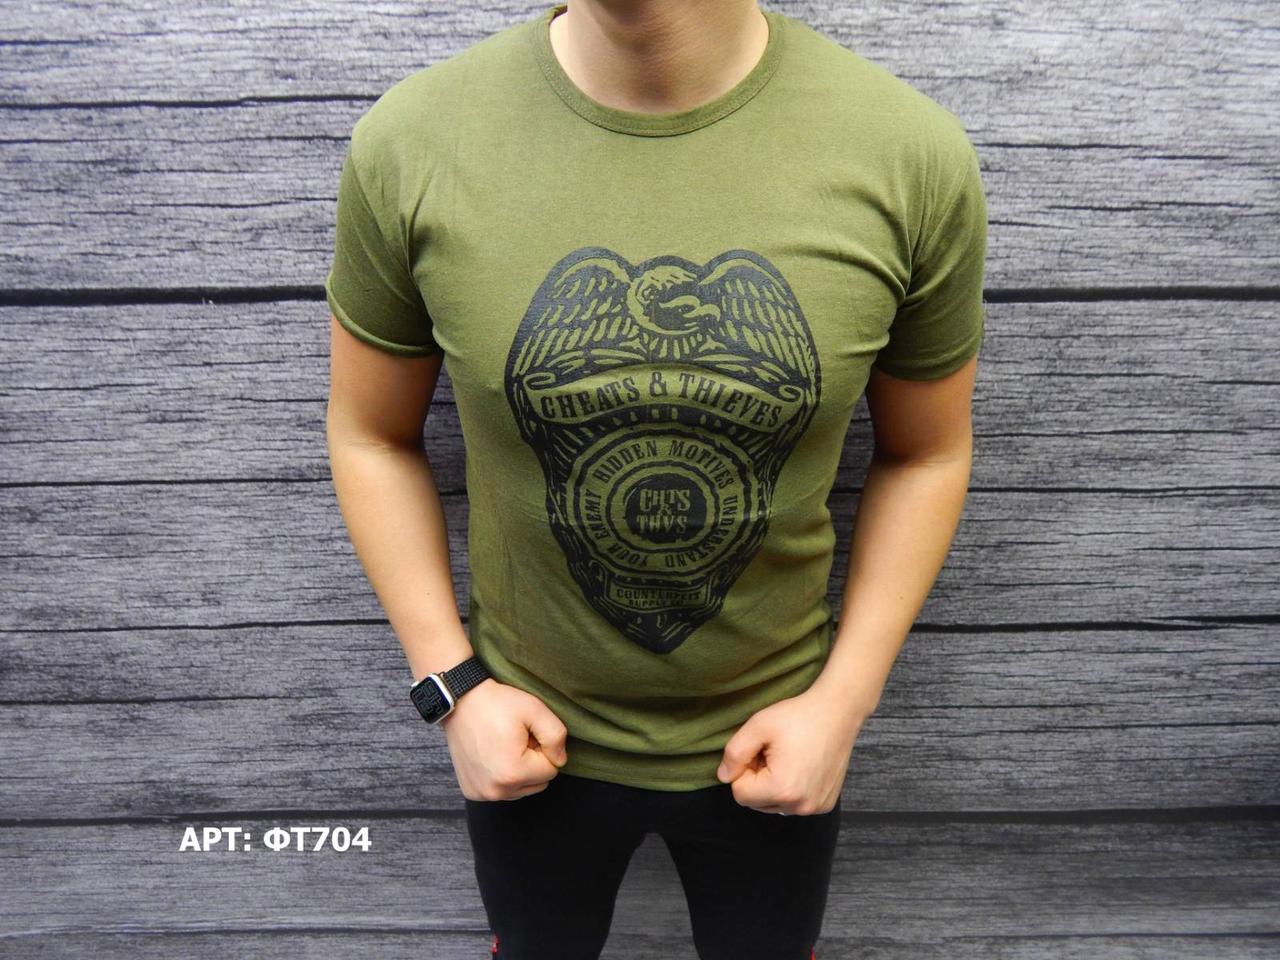 Мужская футболка. Размеры: M, L, XL, 2XL (маломерят на размер)